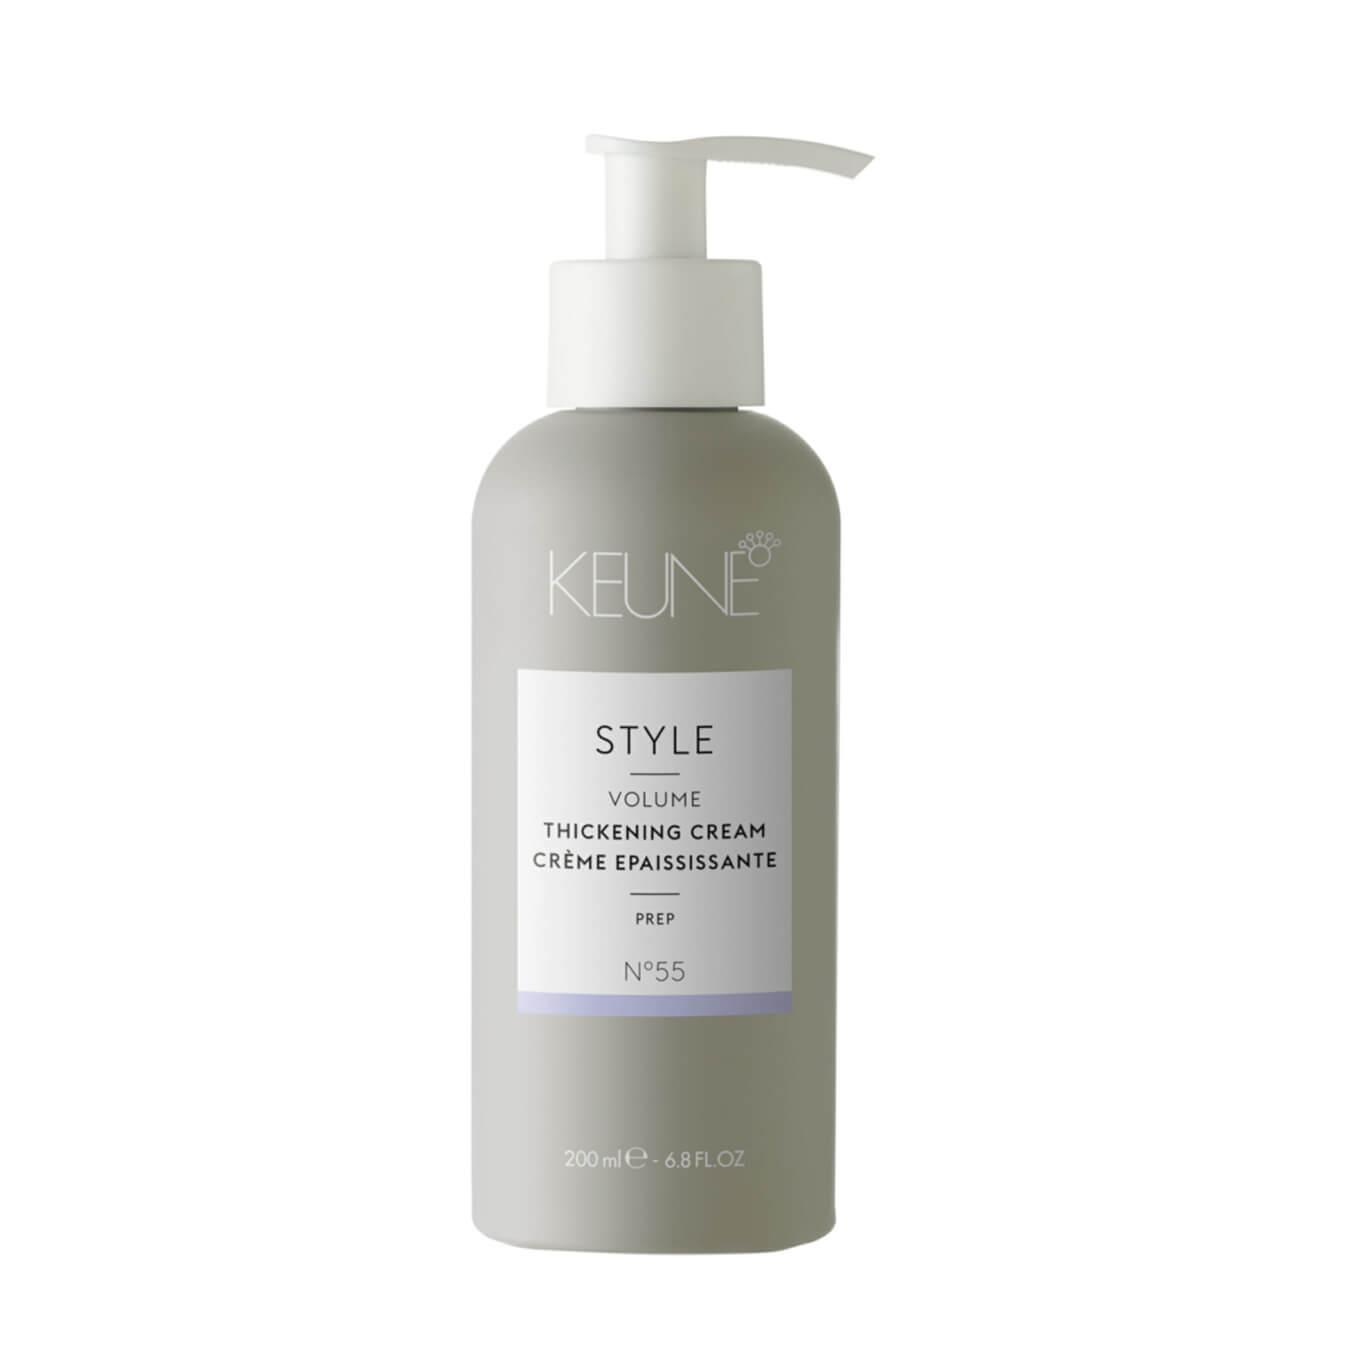 Kauf Keune Style Thickening Cream 200ml